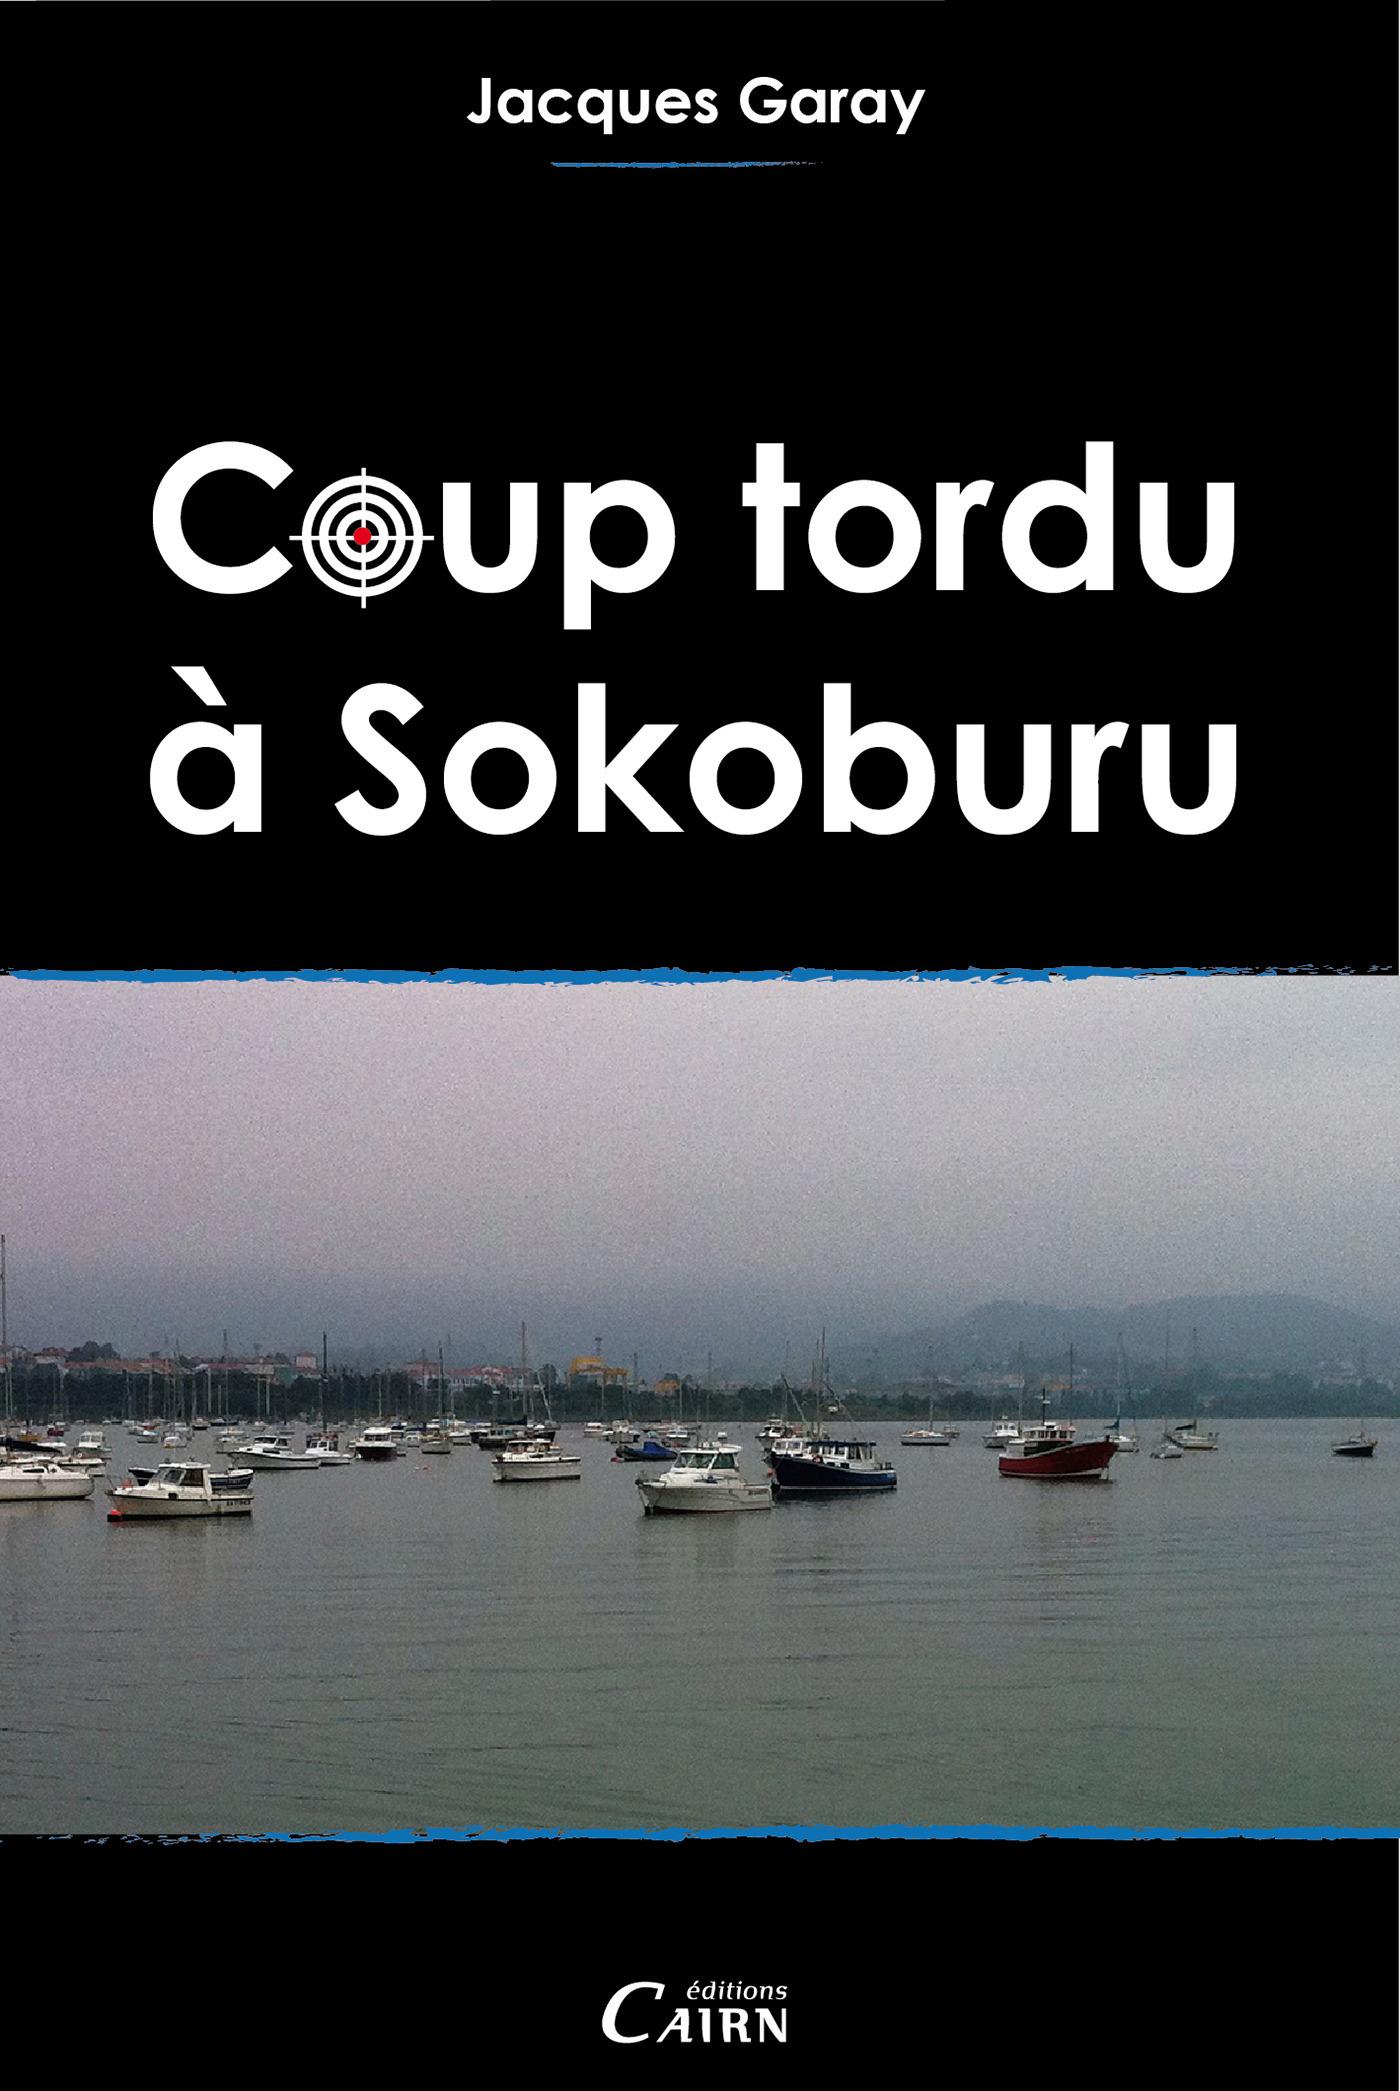 coup tordu à Sokoburru